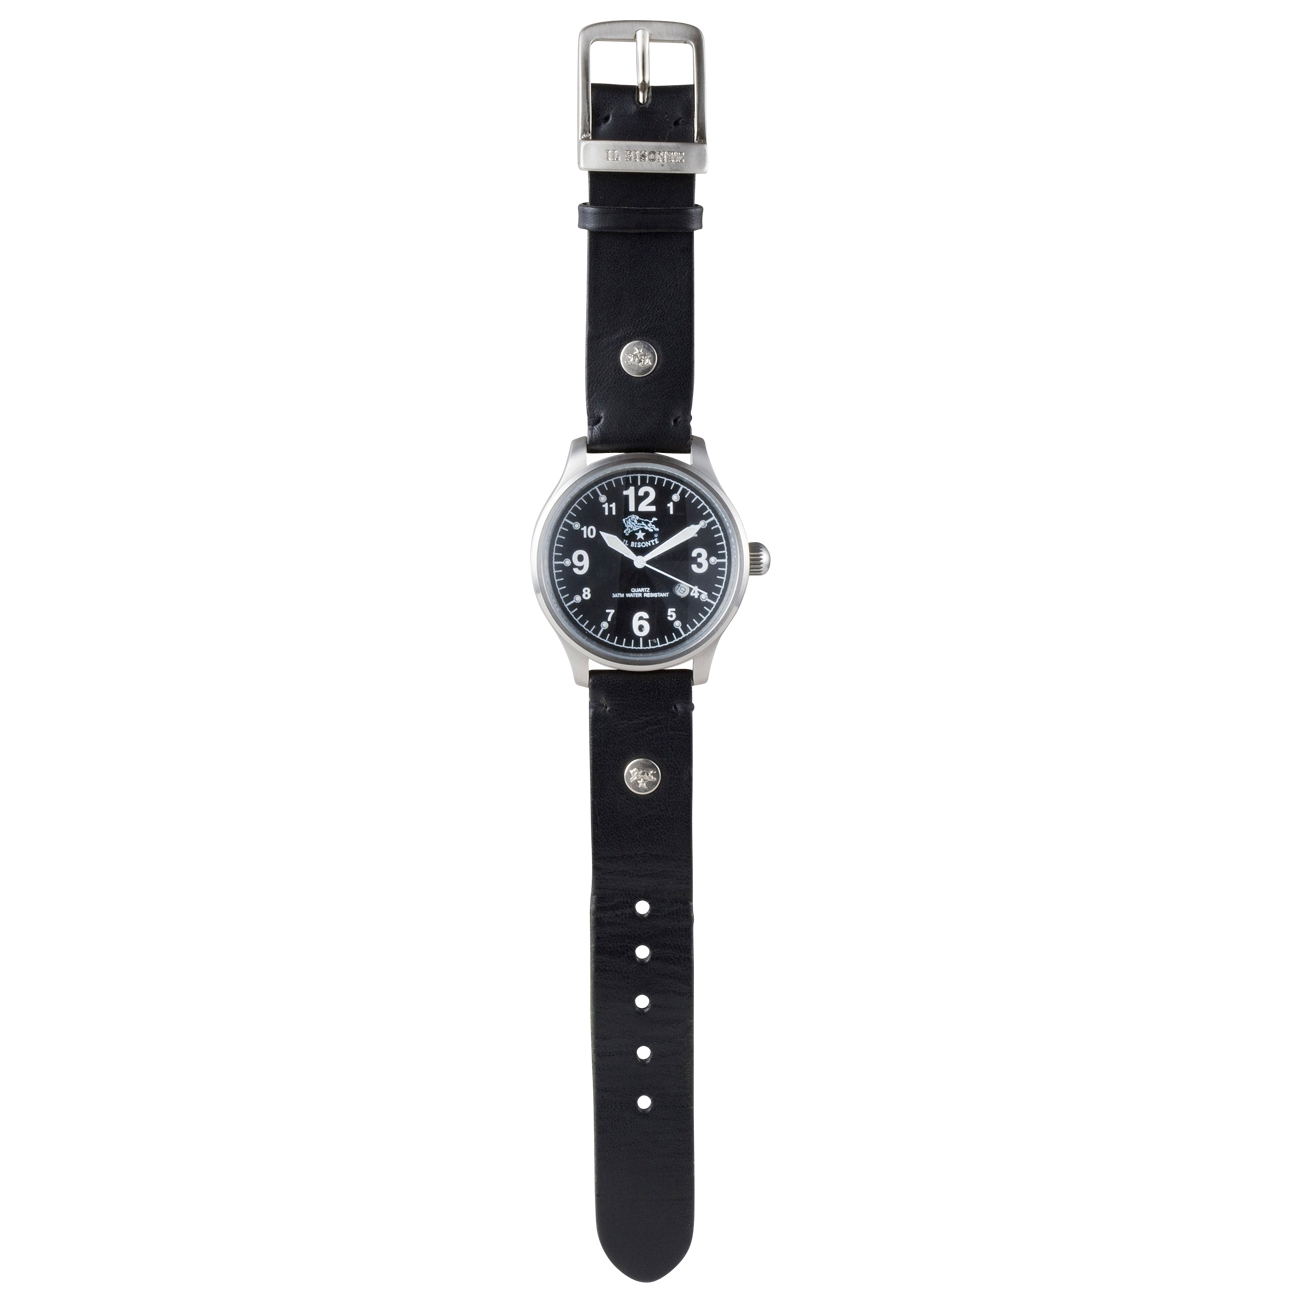 IL BISONTE (イル ビゾンテ) 日本公式オンラインストア  腕時計(ベルト) 5422310497